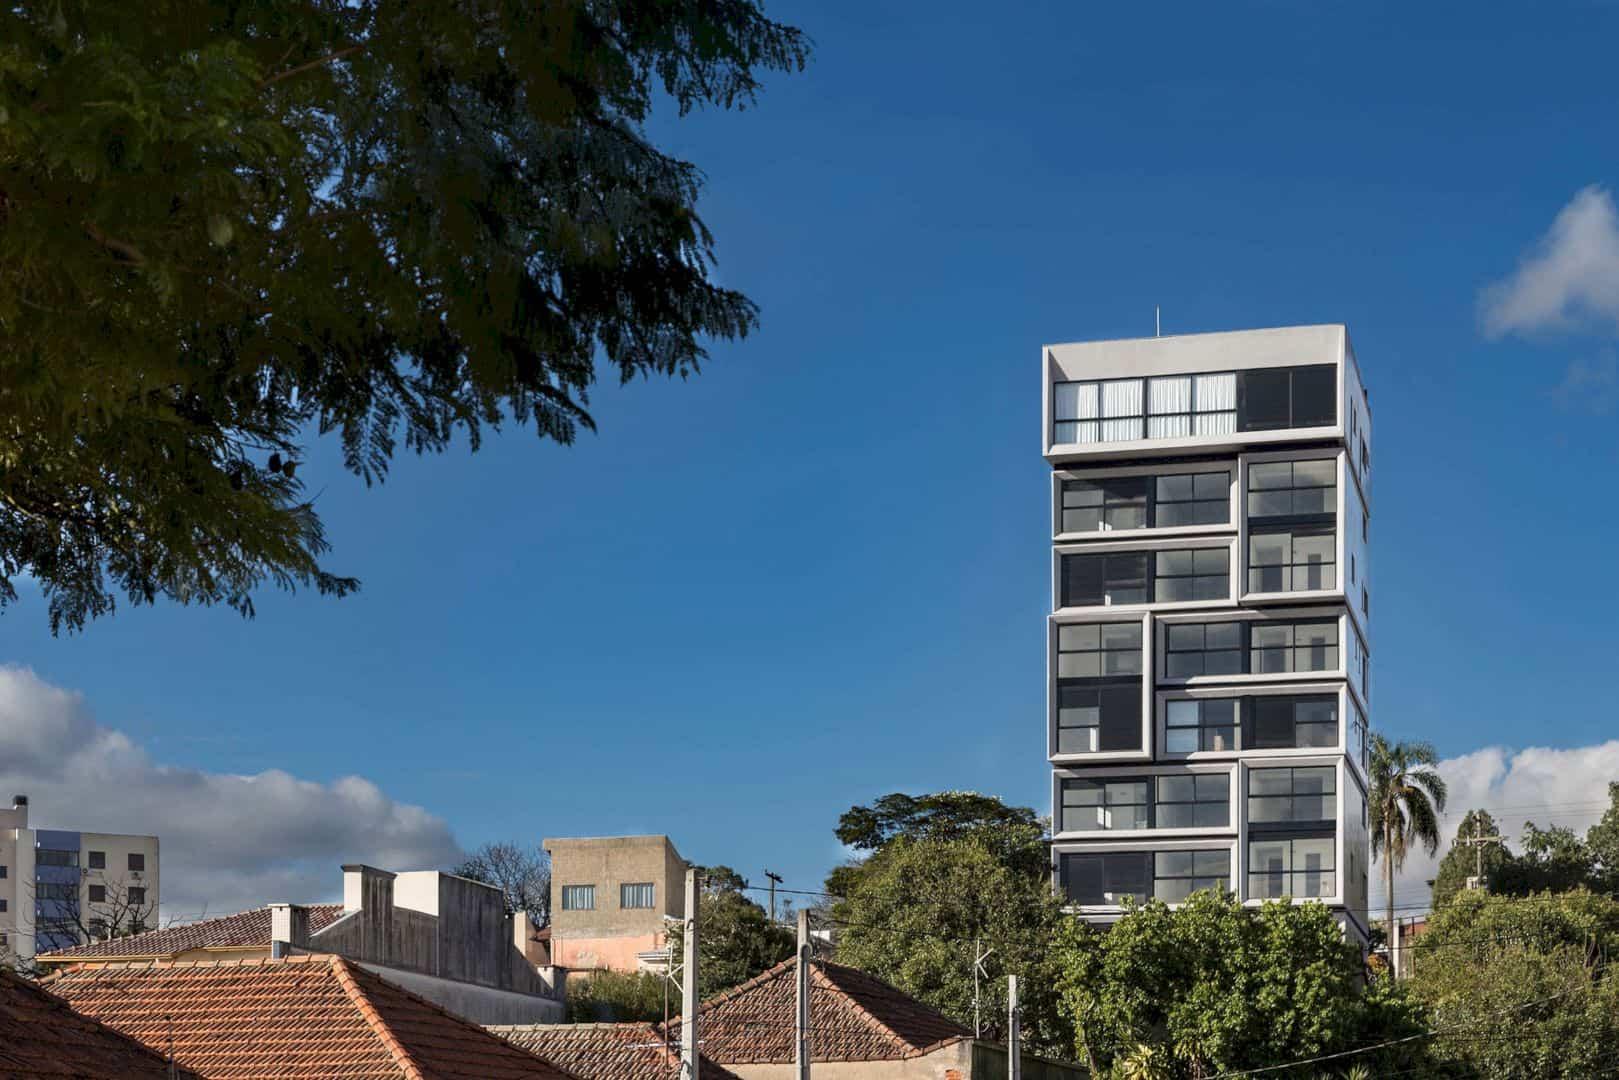 Fernando Abbott 866 A High Rise Residential Building In Porto Alegre 20